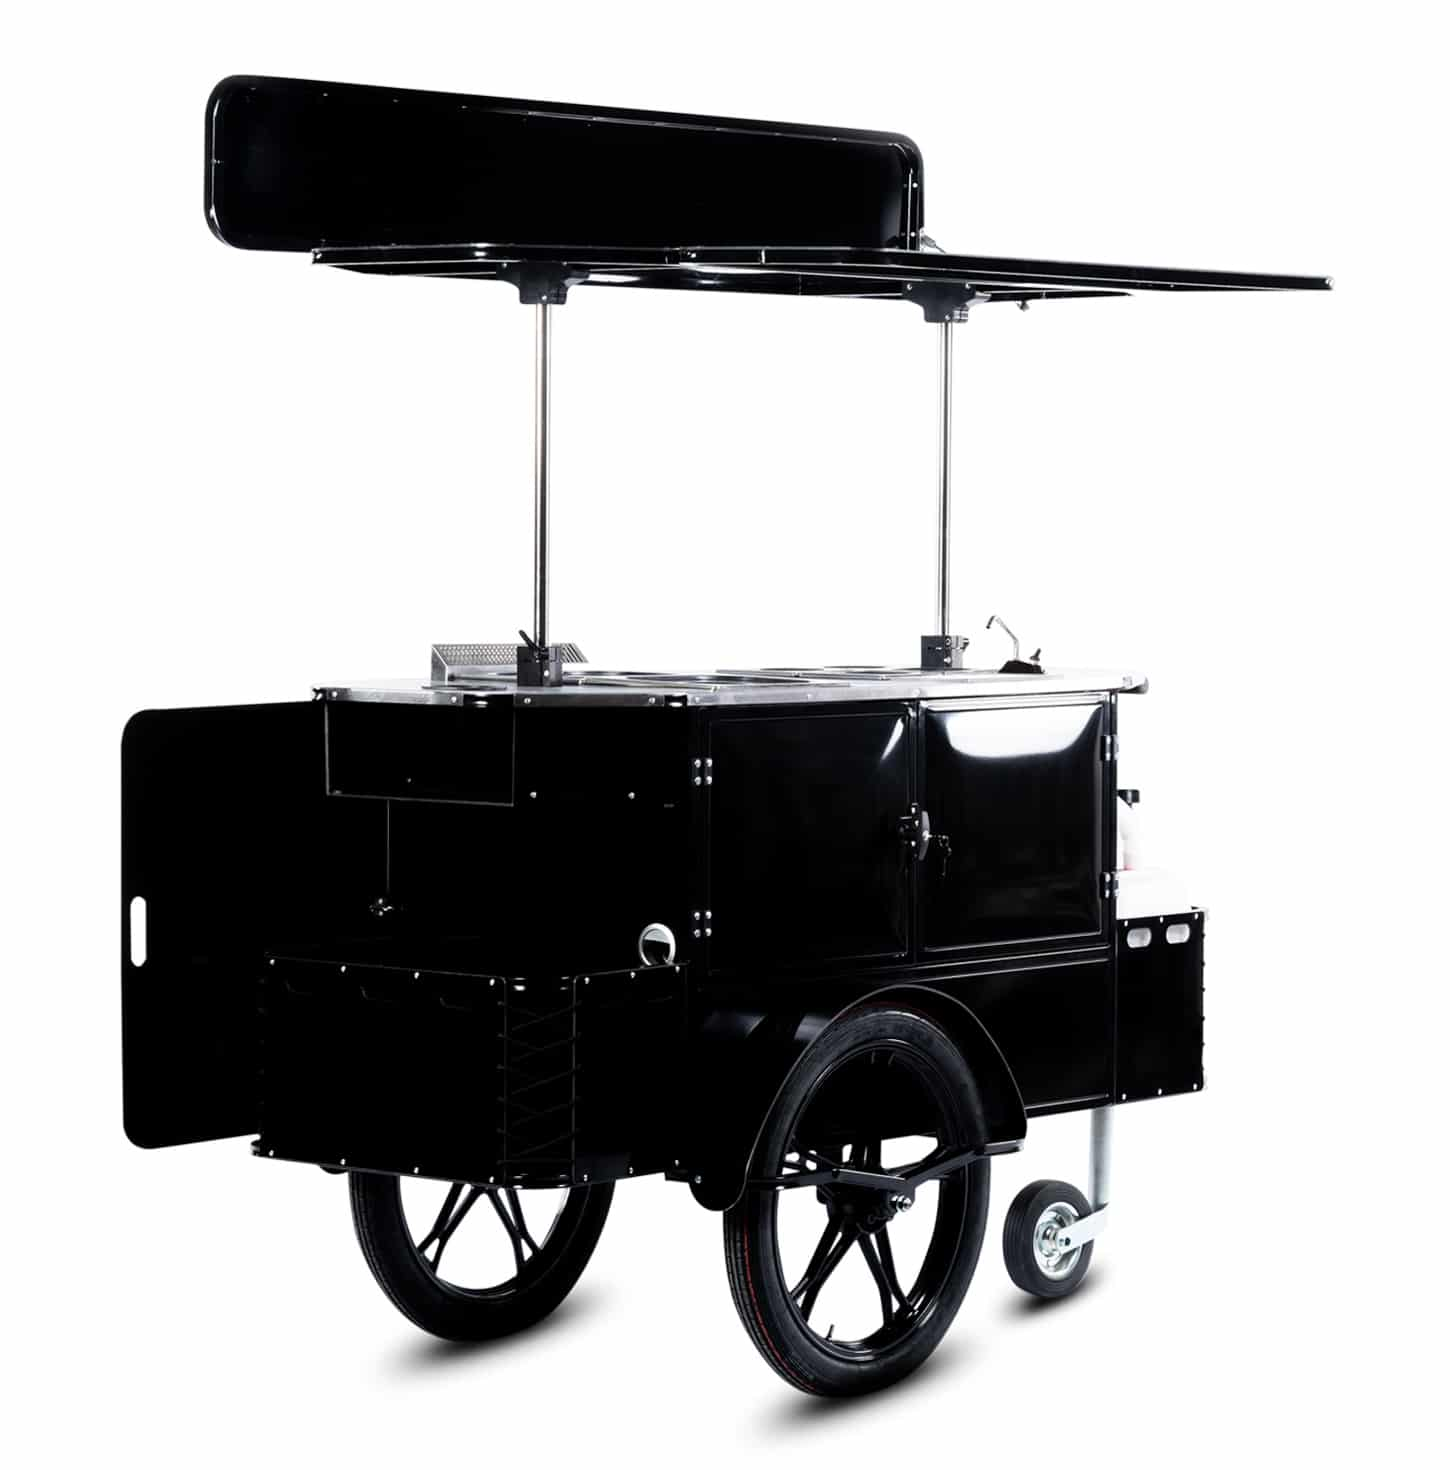 Bizz On Wheels hot dog cart